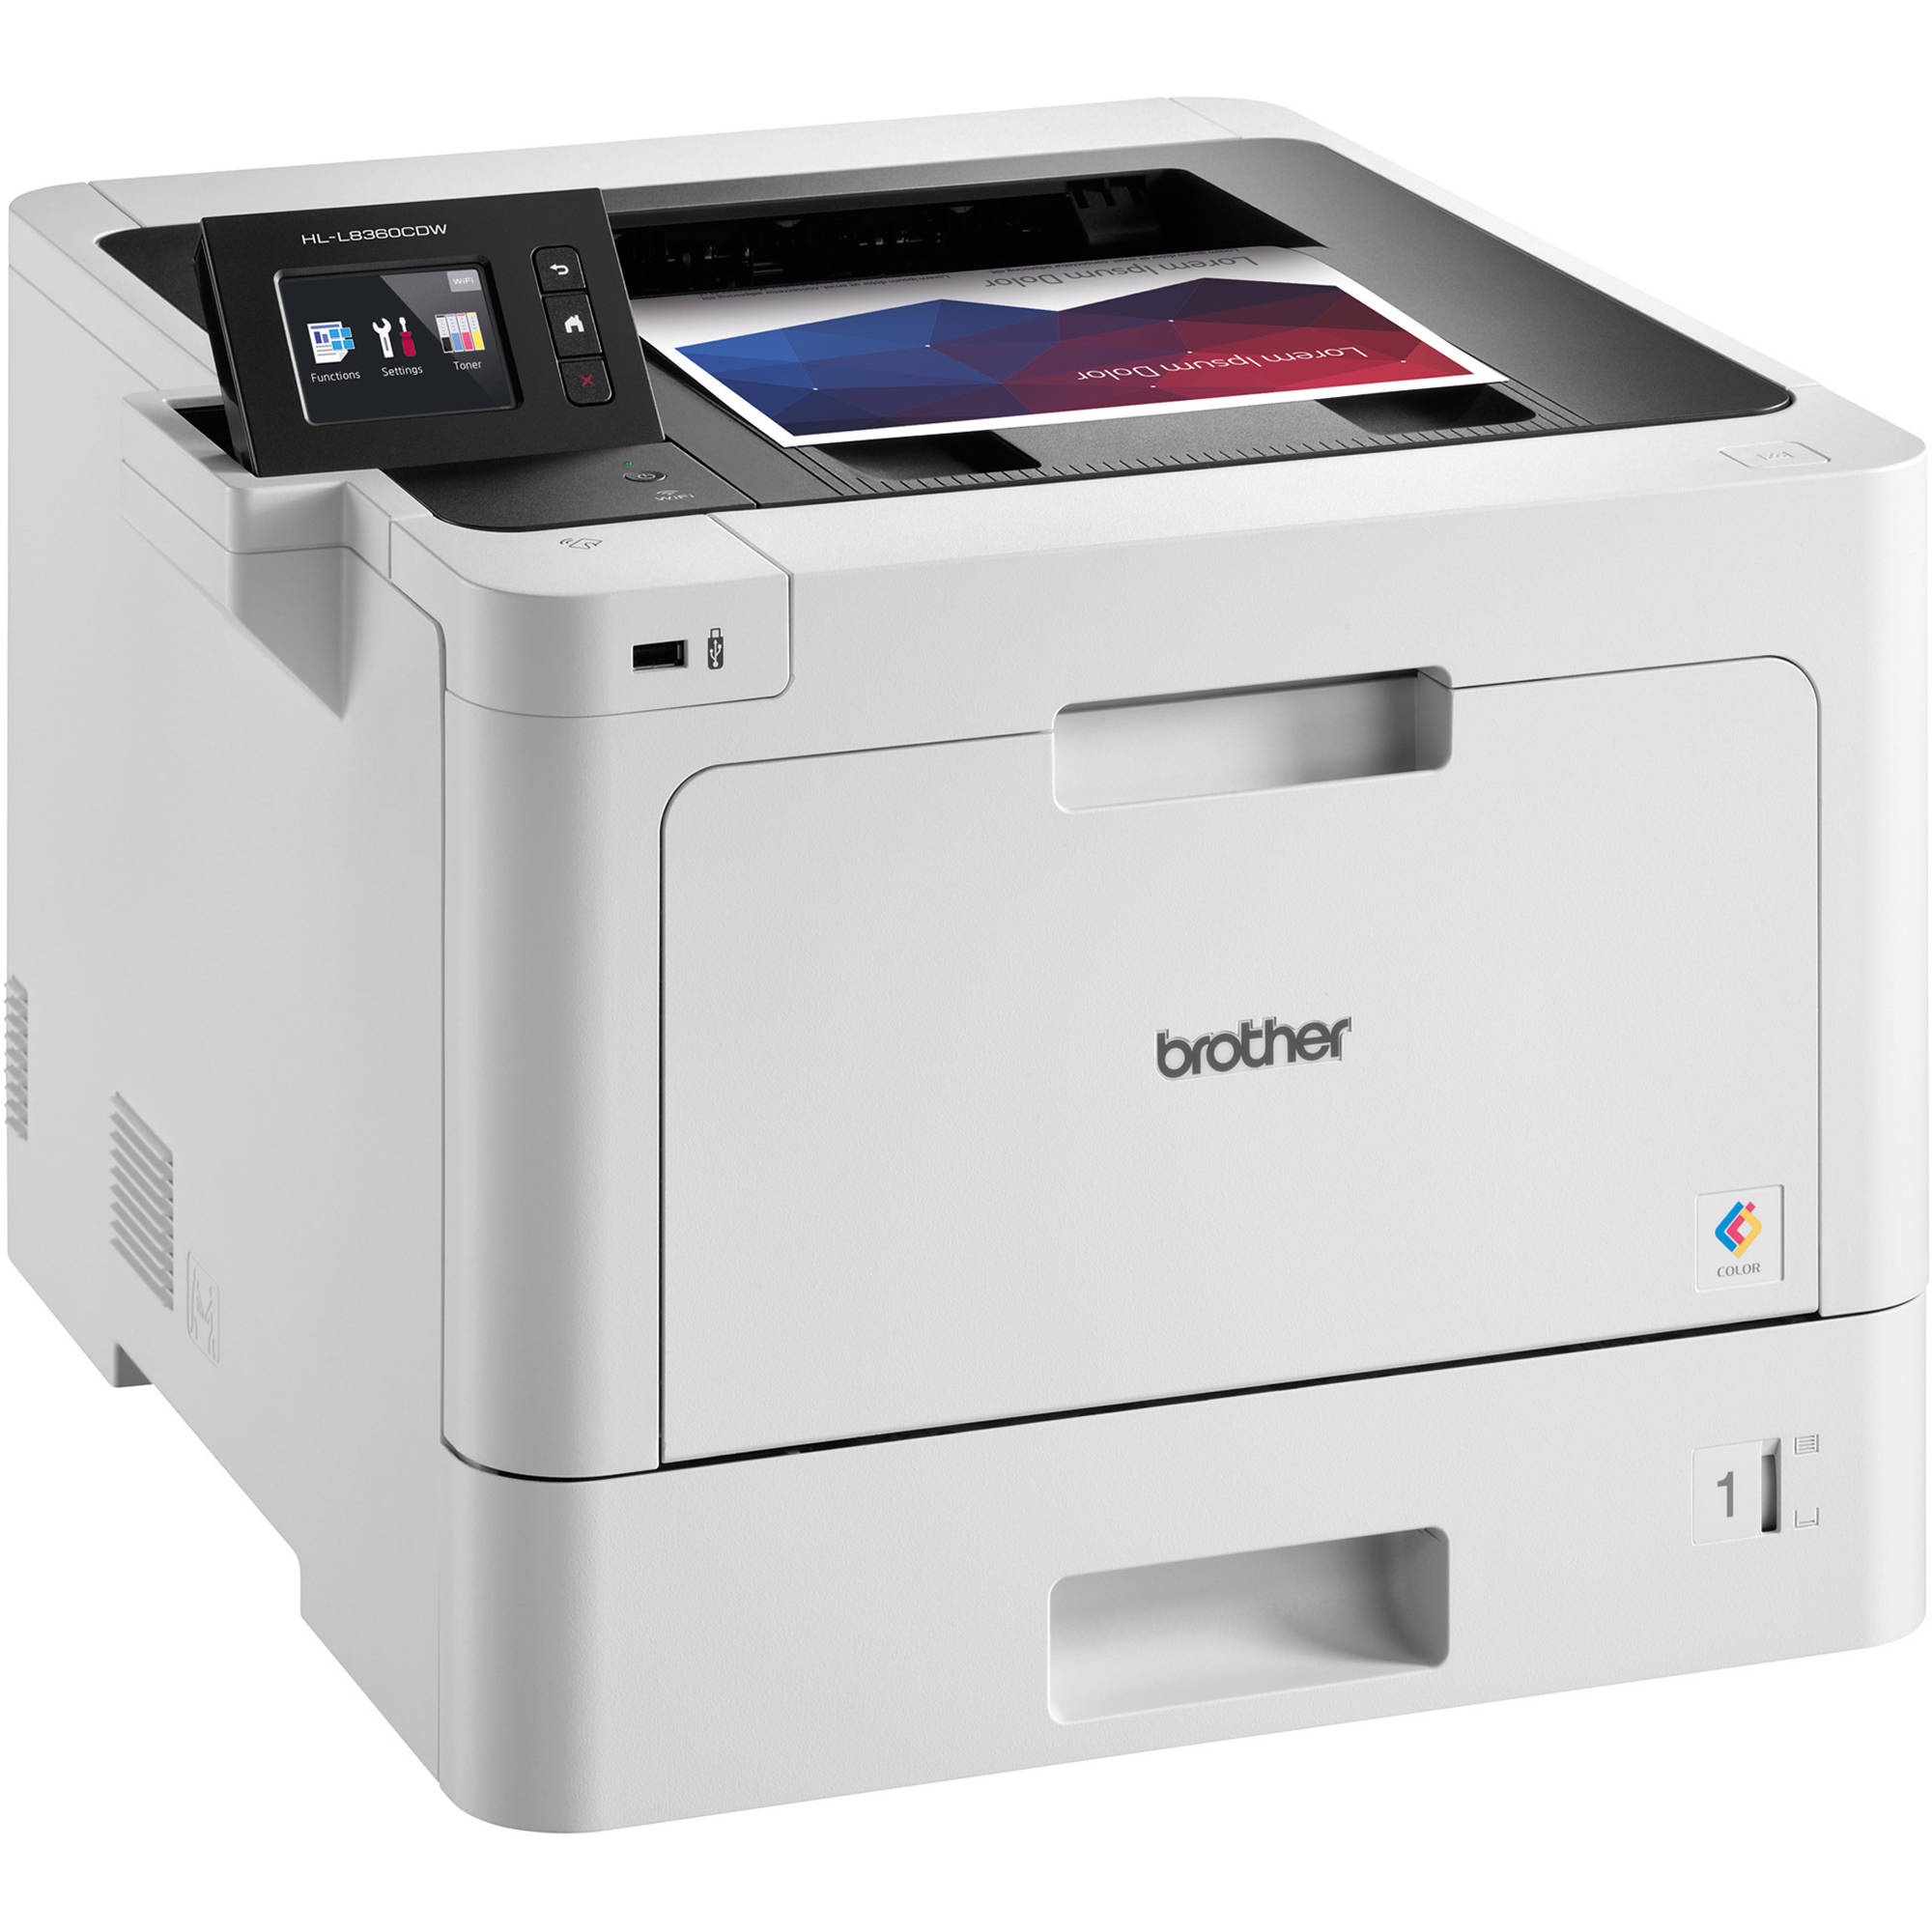 Brother HL L8360CDW Color Laser Printer HL L8360CDW BampH Photo